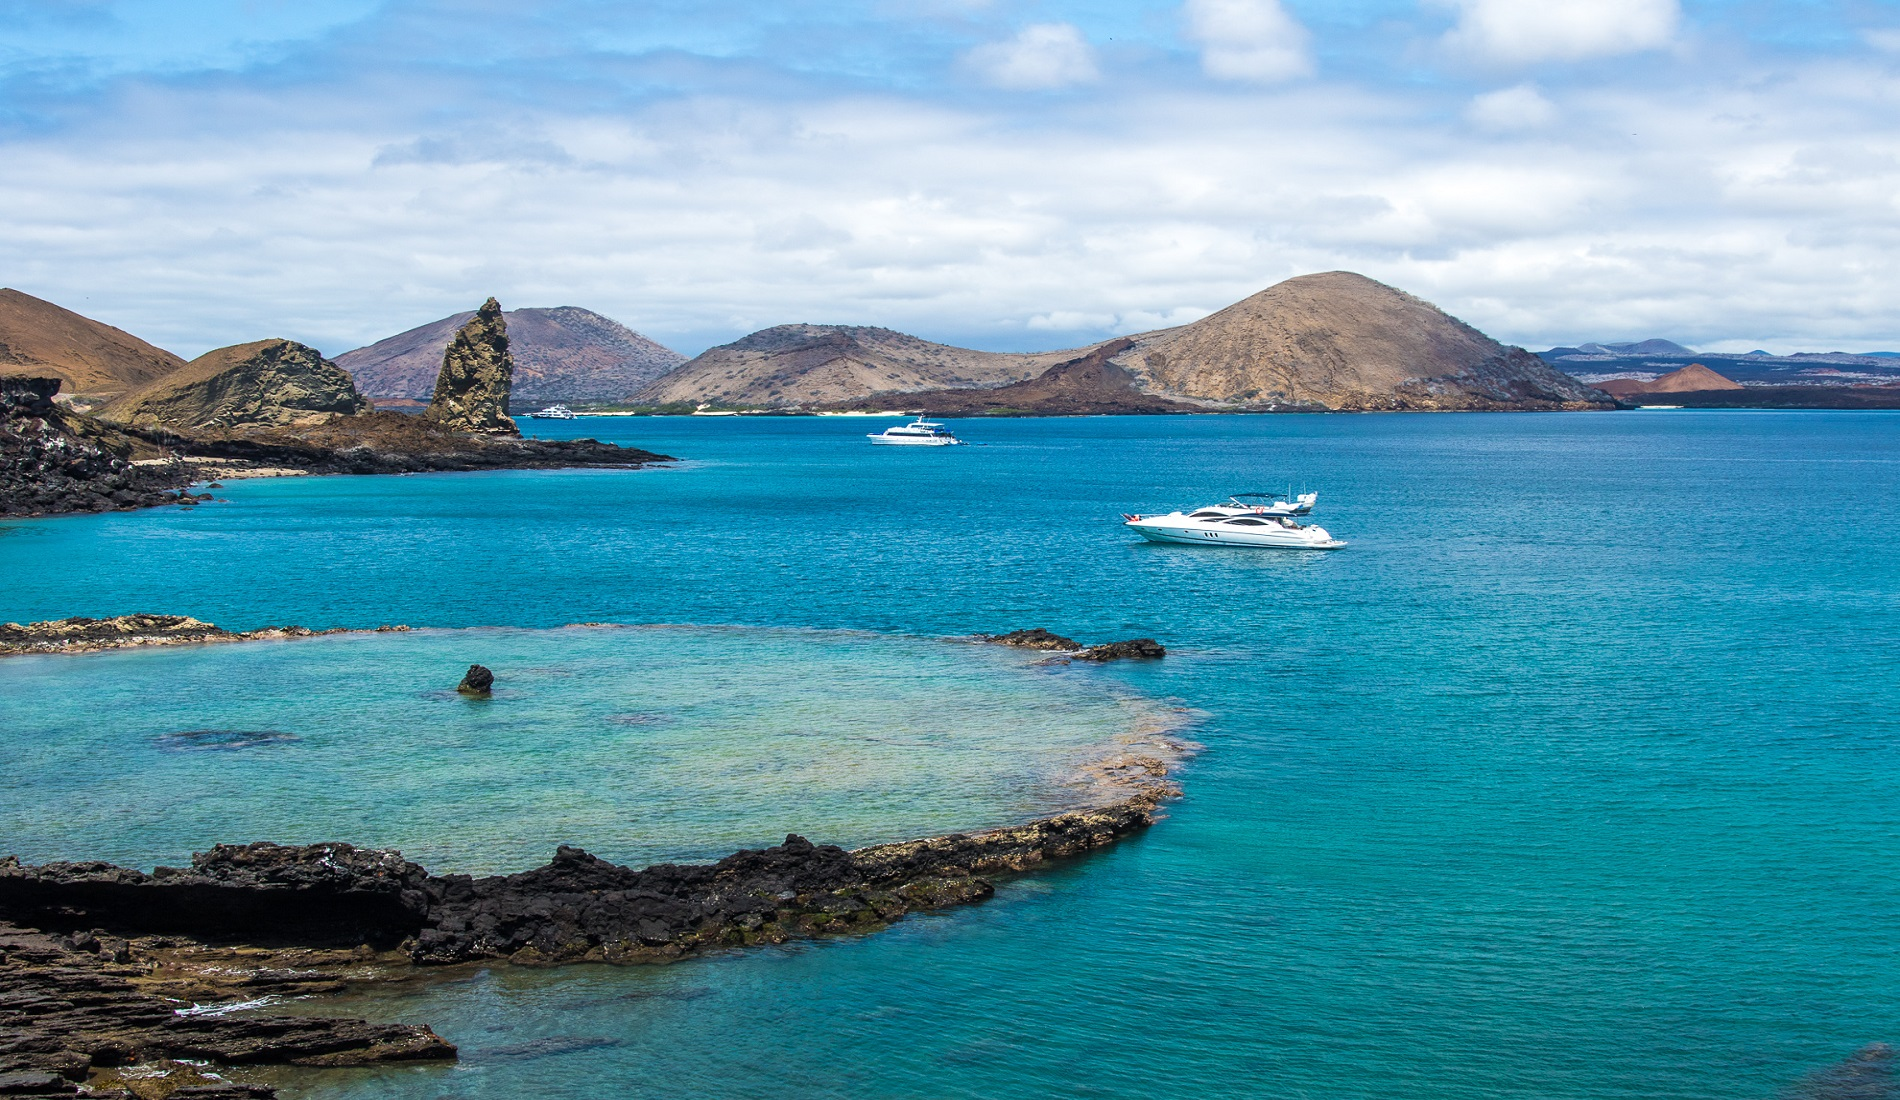 Bartolome & Sullivan Bay eilandhoppen galapagos eilanden